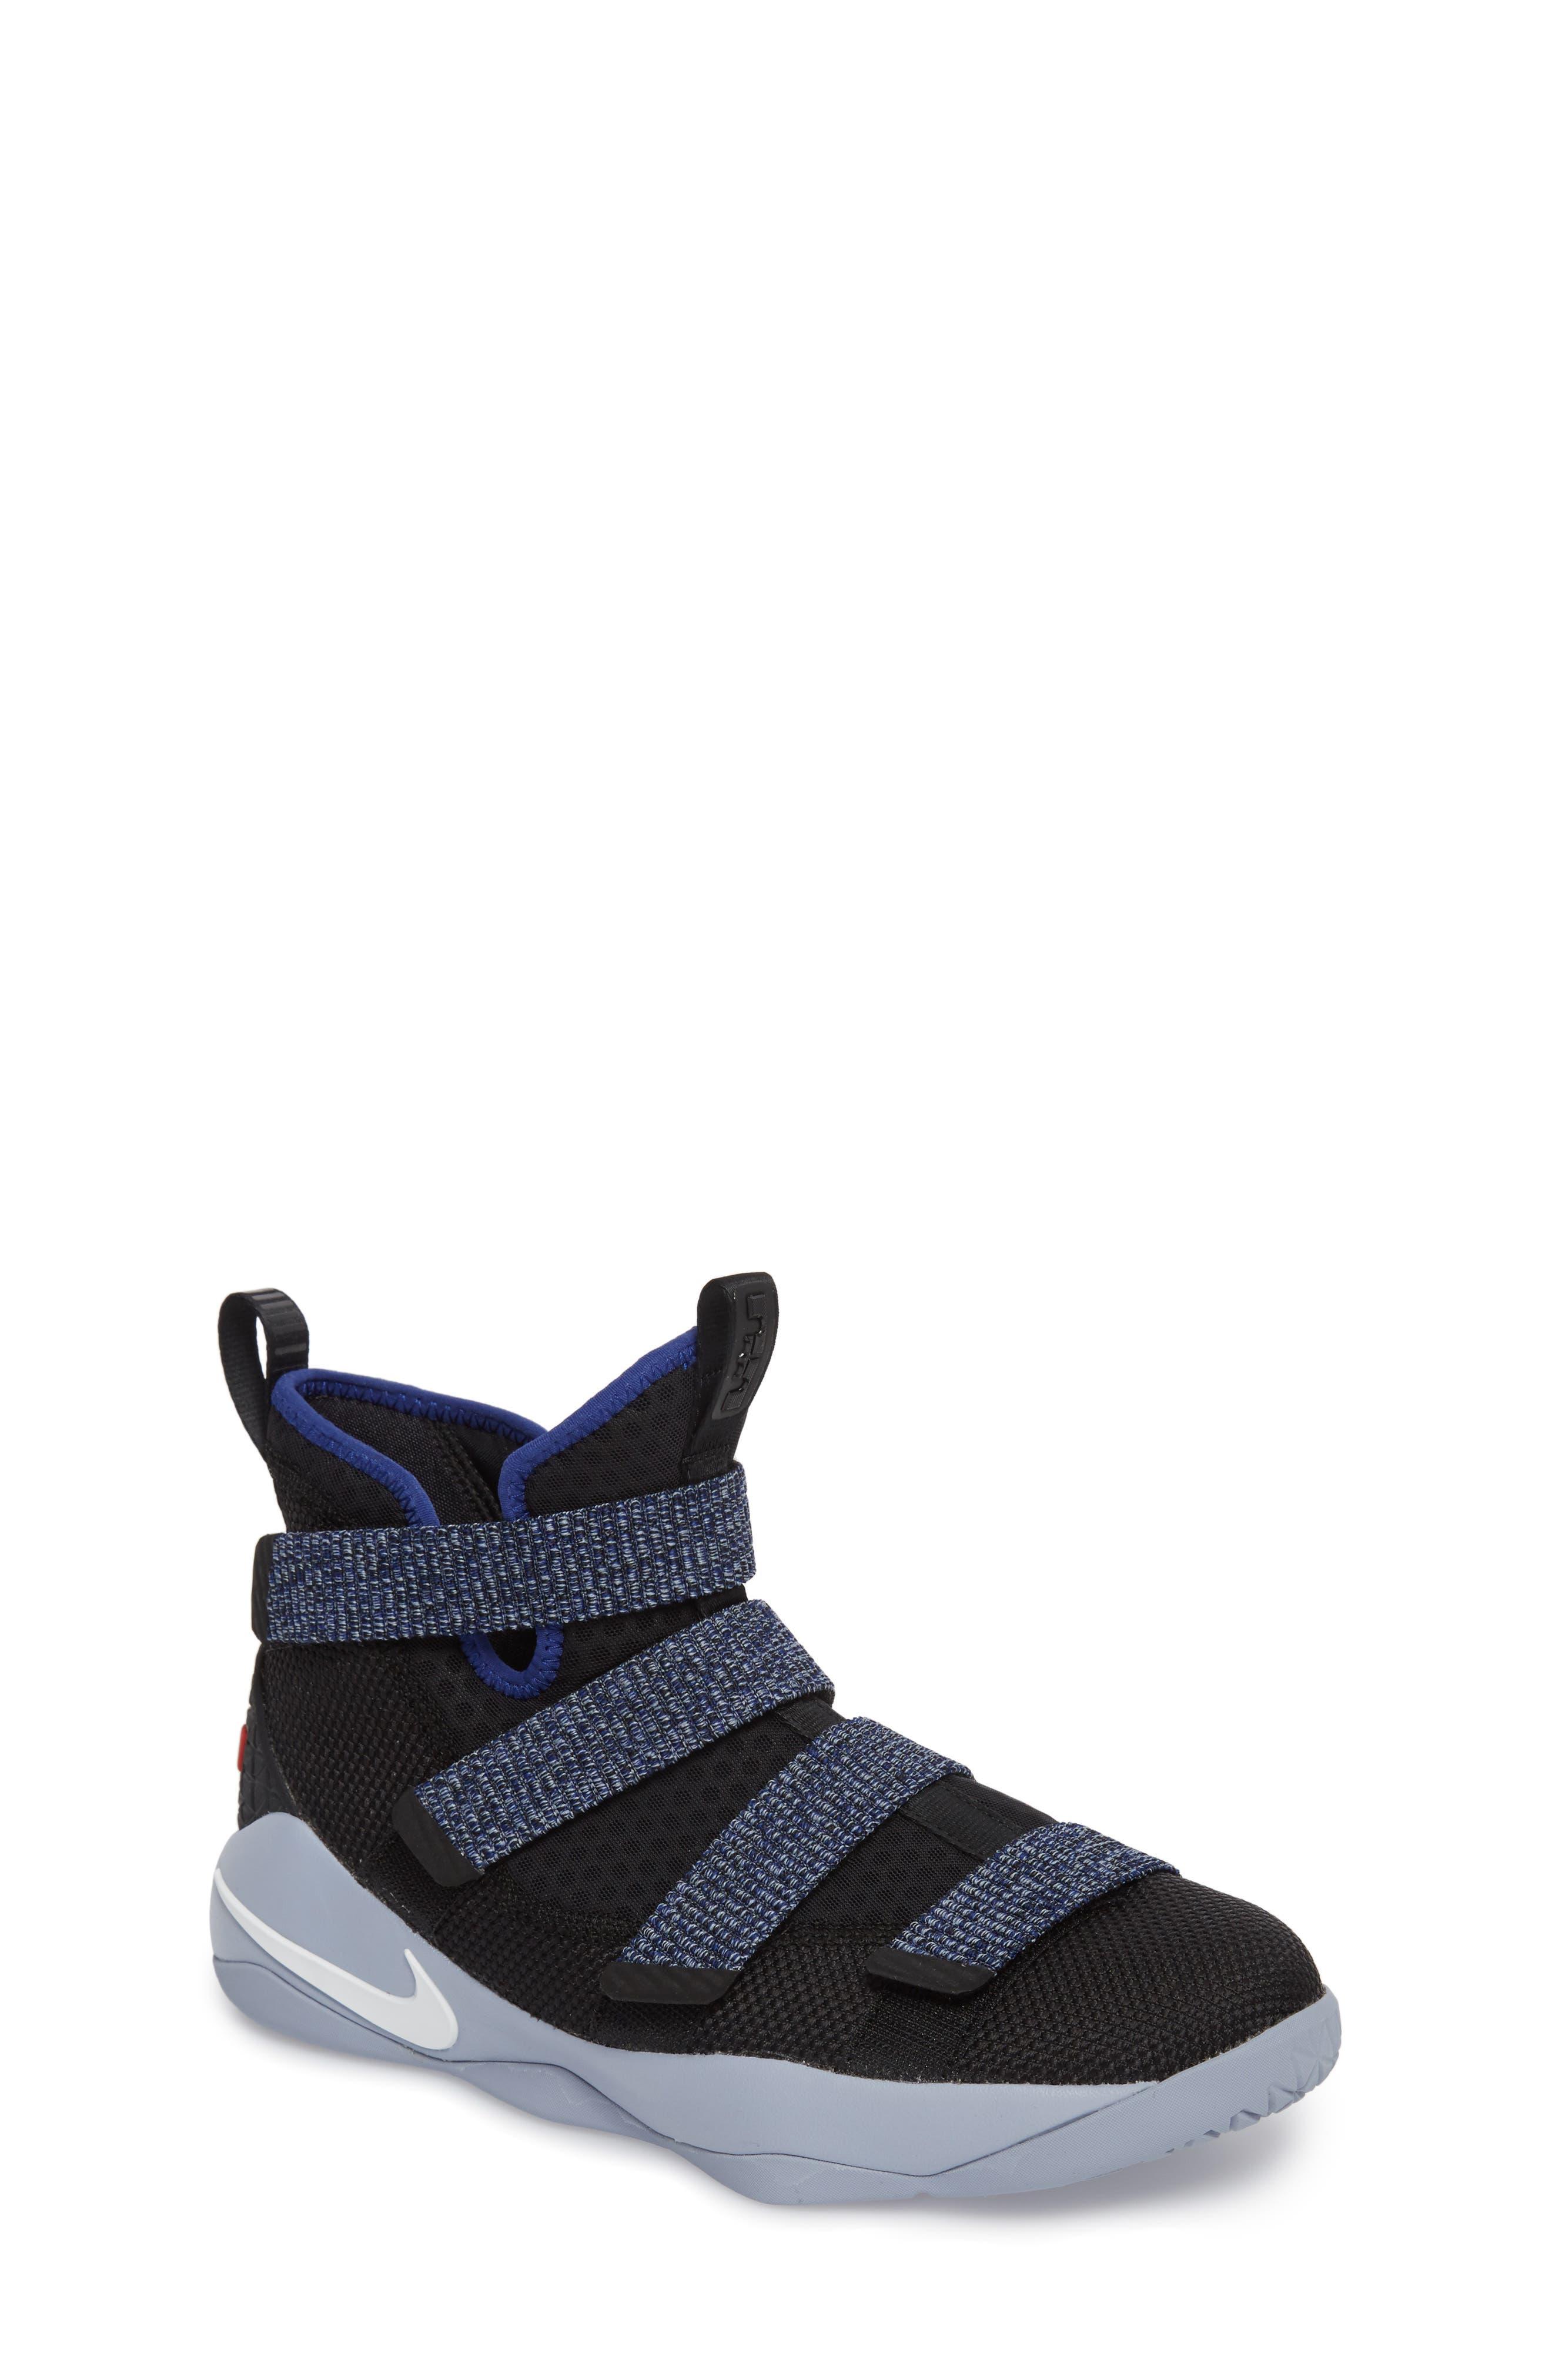 LeBron Soldier XI Basketball Shoe,                         Main,                         color, 005